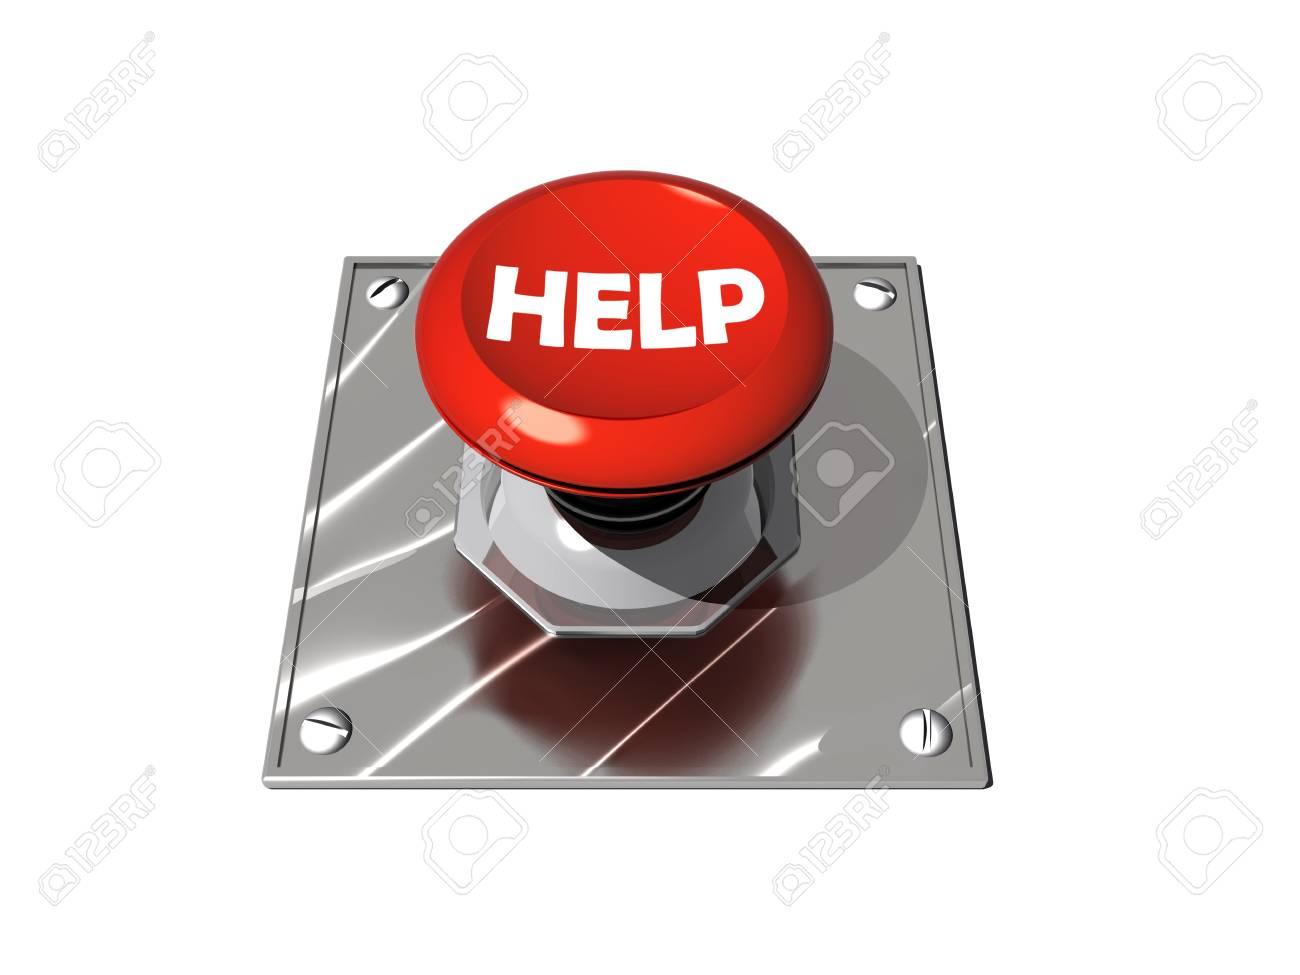 Help button illustration Stock Photo - 8766750